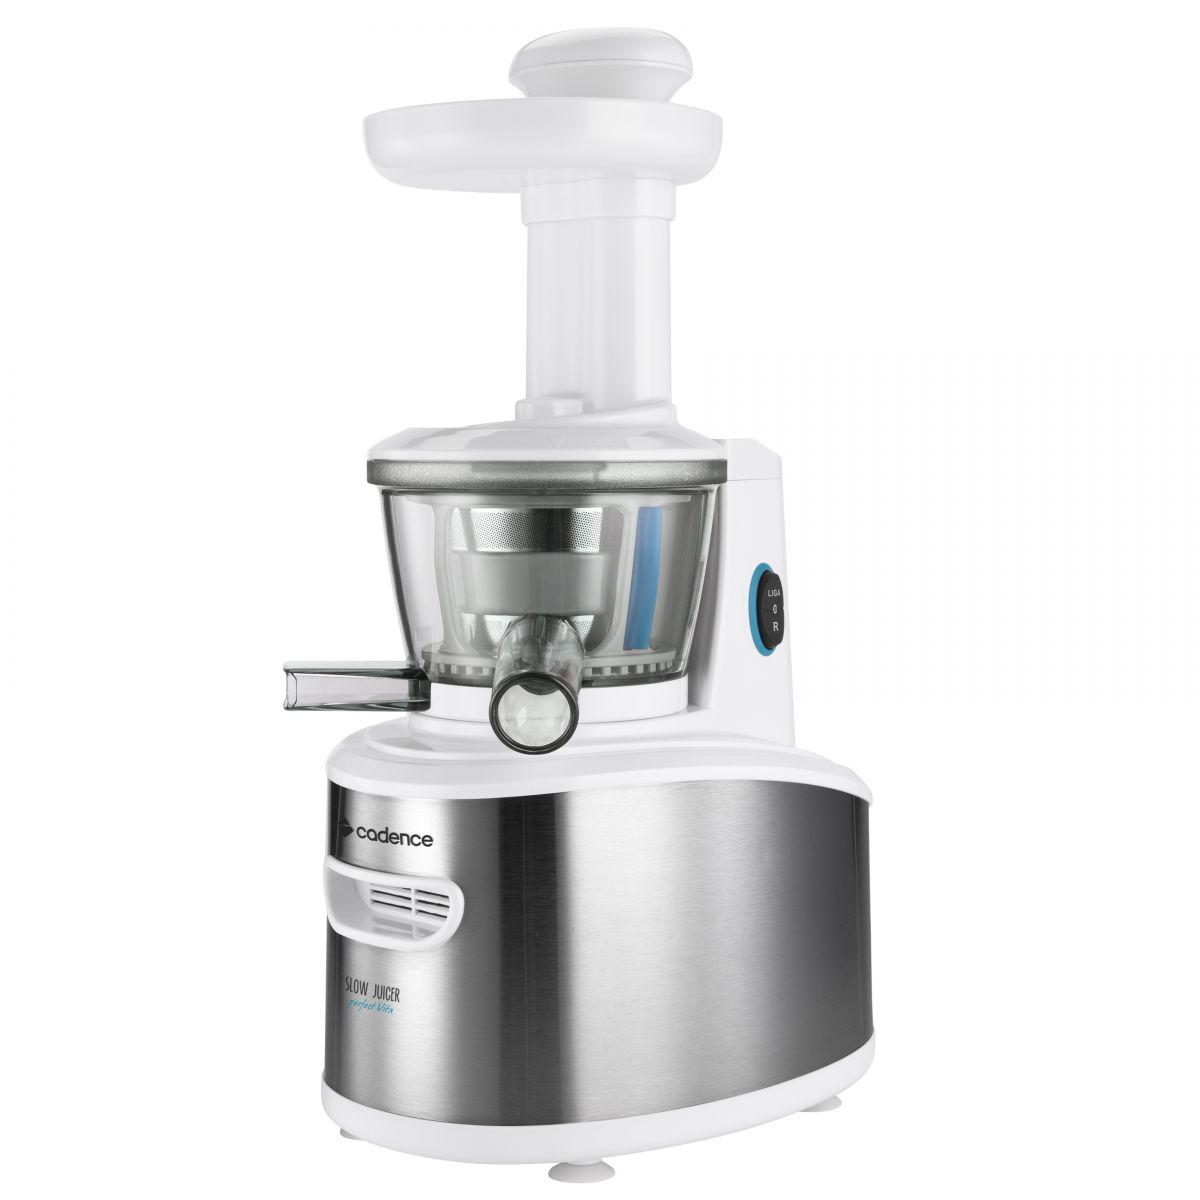 Centrífuga Slow Juicer Perfect Vita Cadence JCR900 - 127V  - ShopNoroeste.com.br